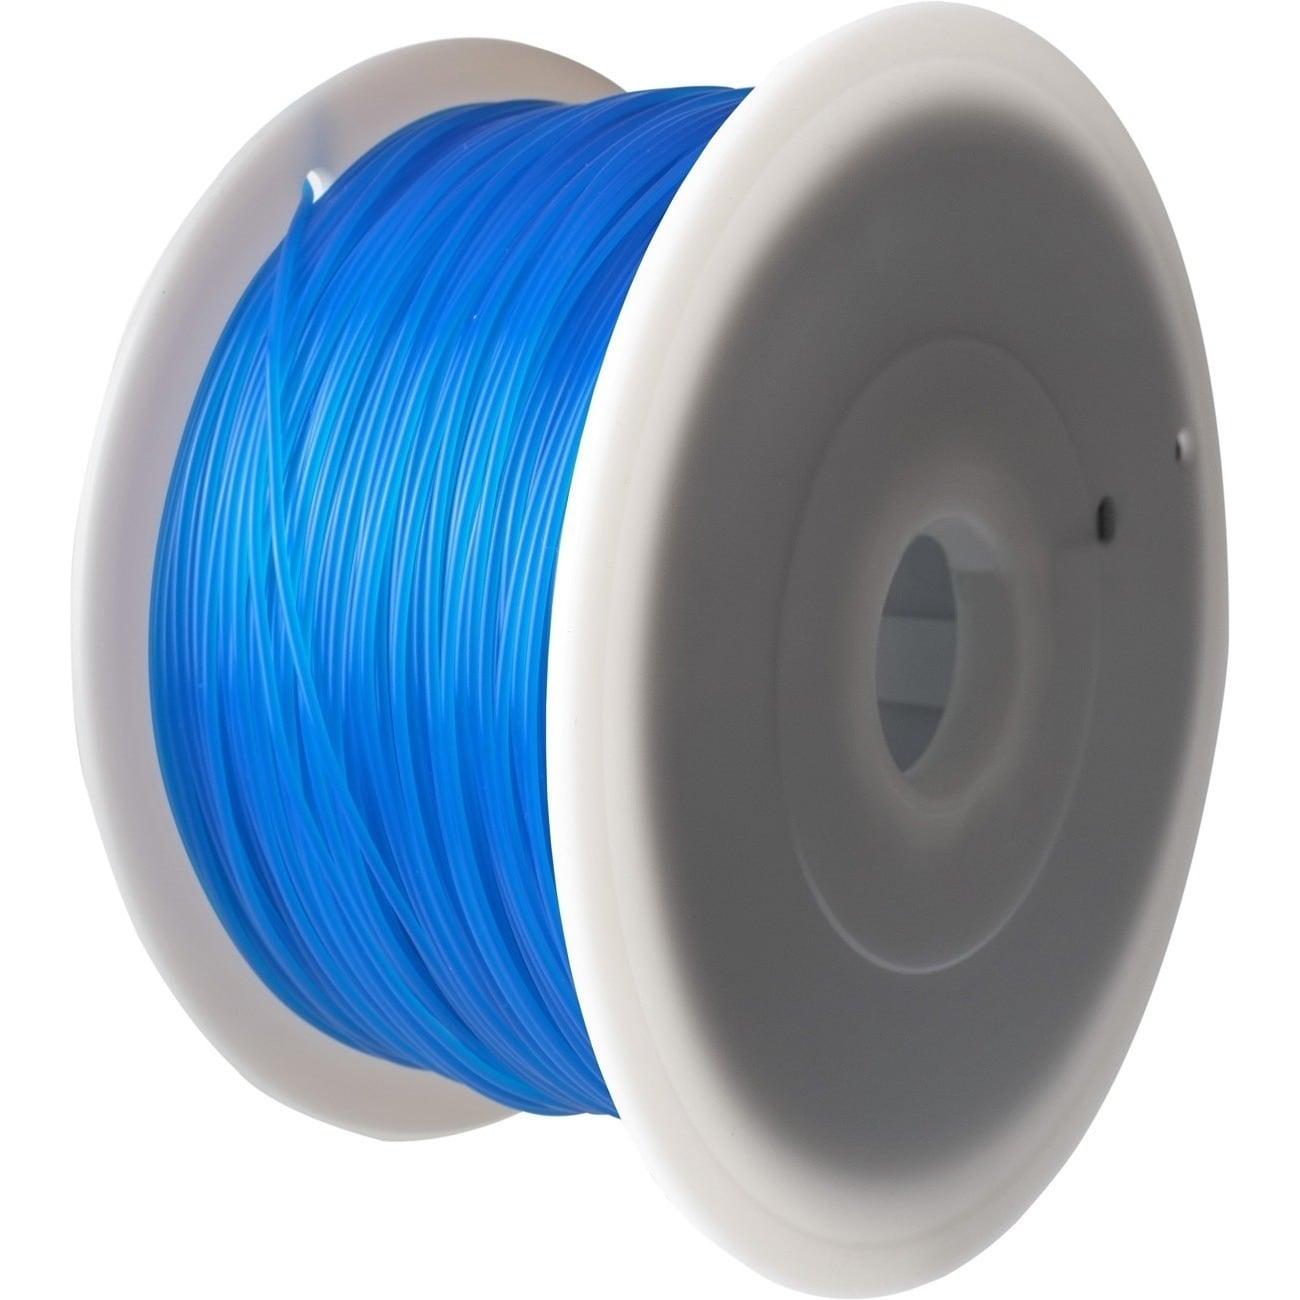 Flashforge 1.75mm PLA Filament Cartridge - Blue -  FLASHFORGE USA, 3D-FFG-PLABU